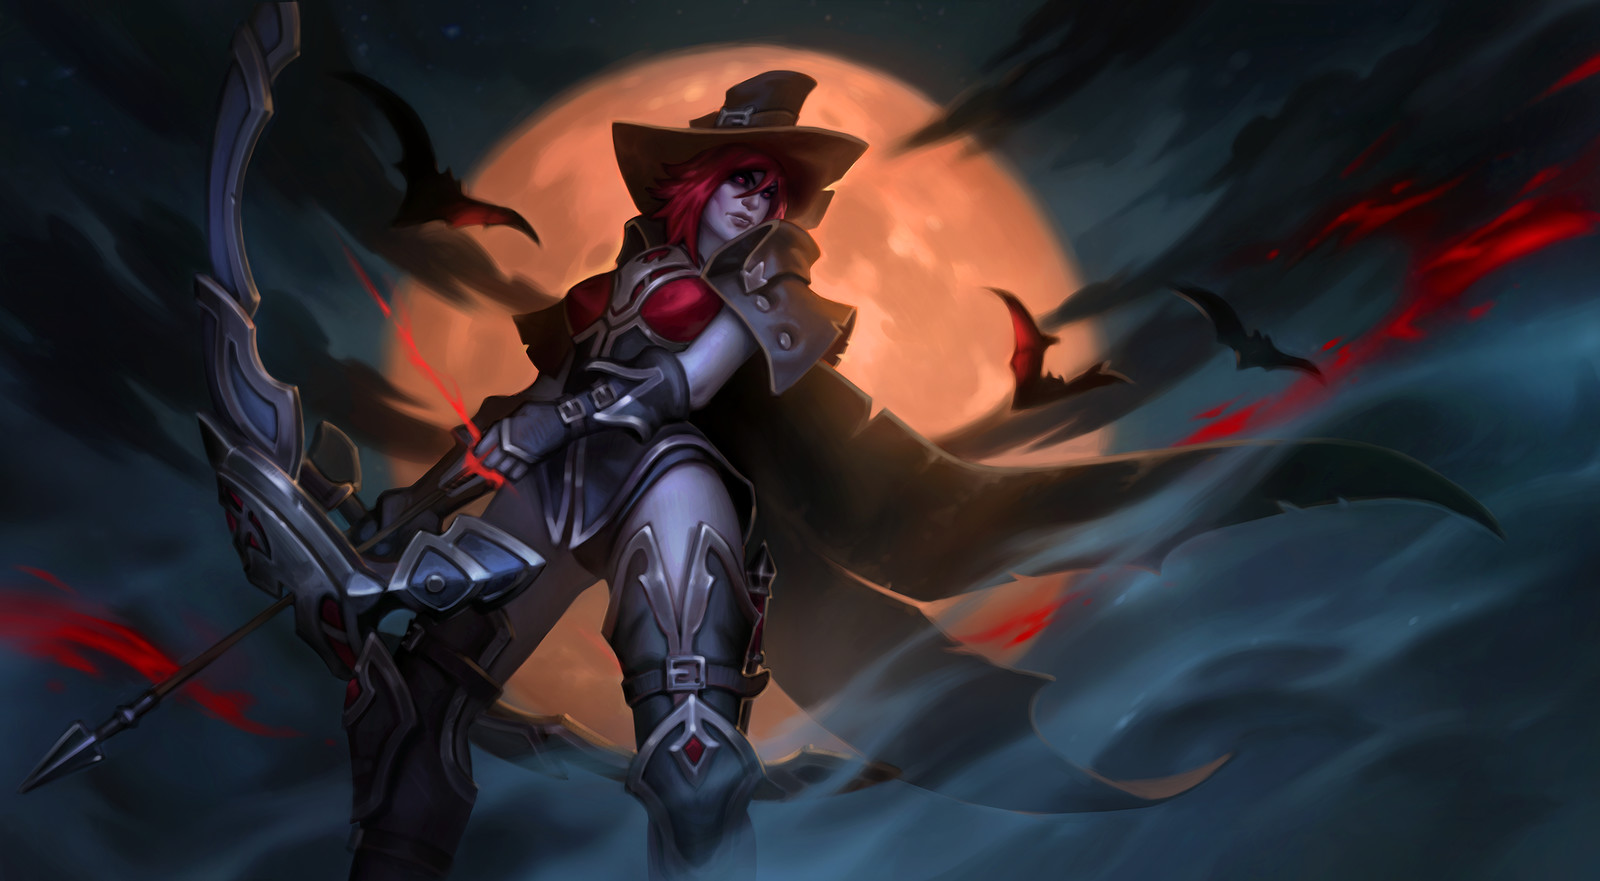 Drow Ranger Dota 2 Immortals: Ekaterina Shapovalova Portfolio